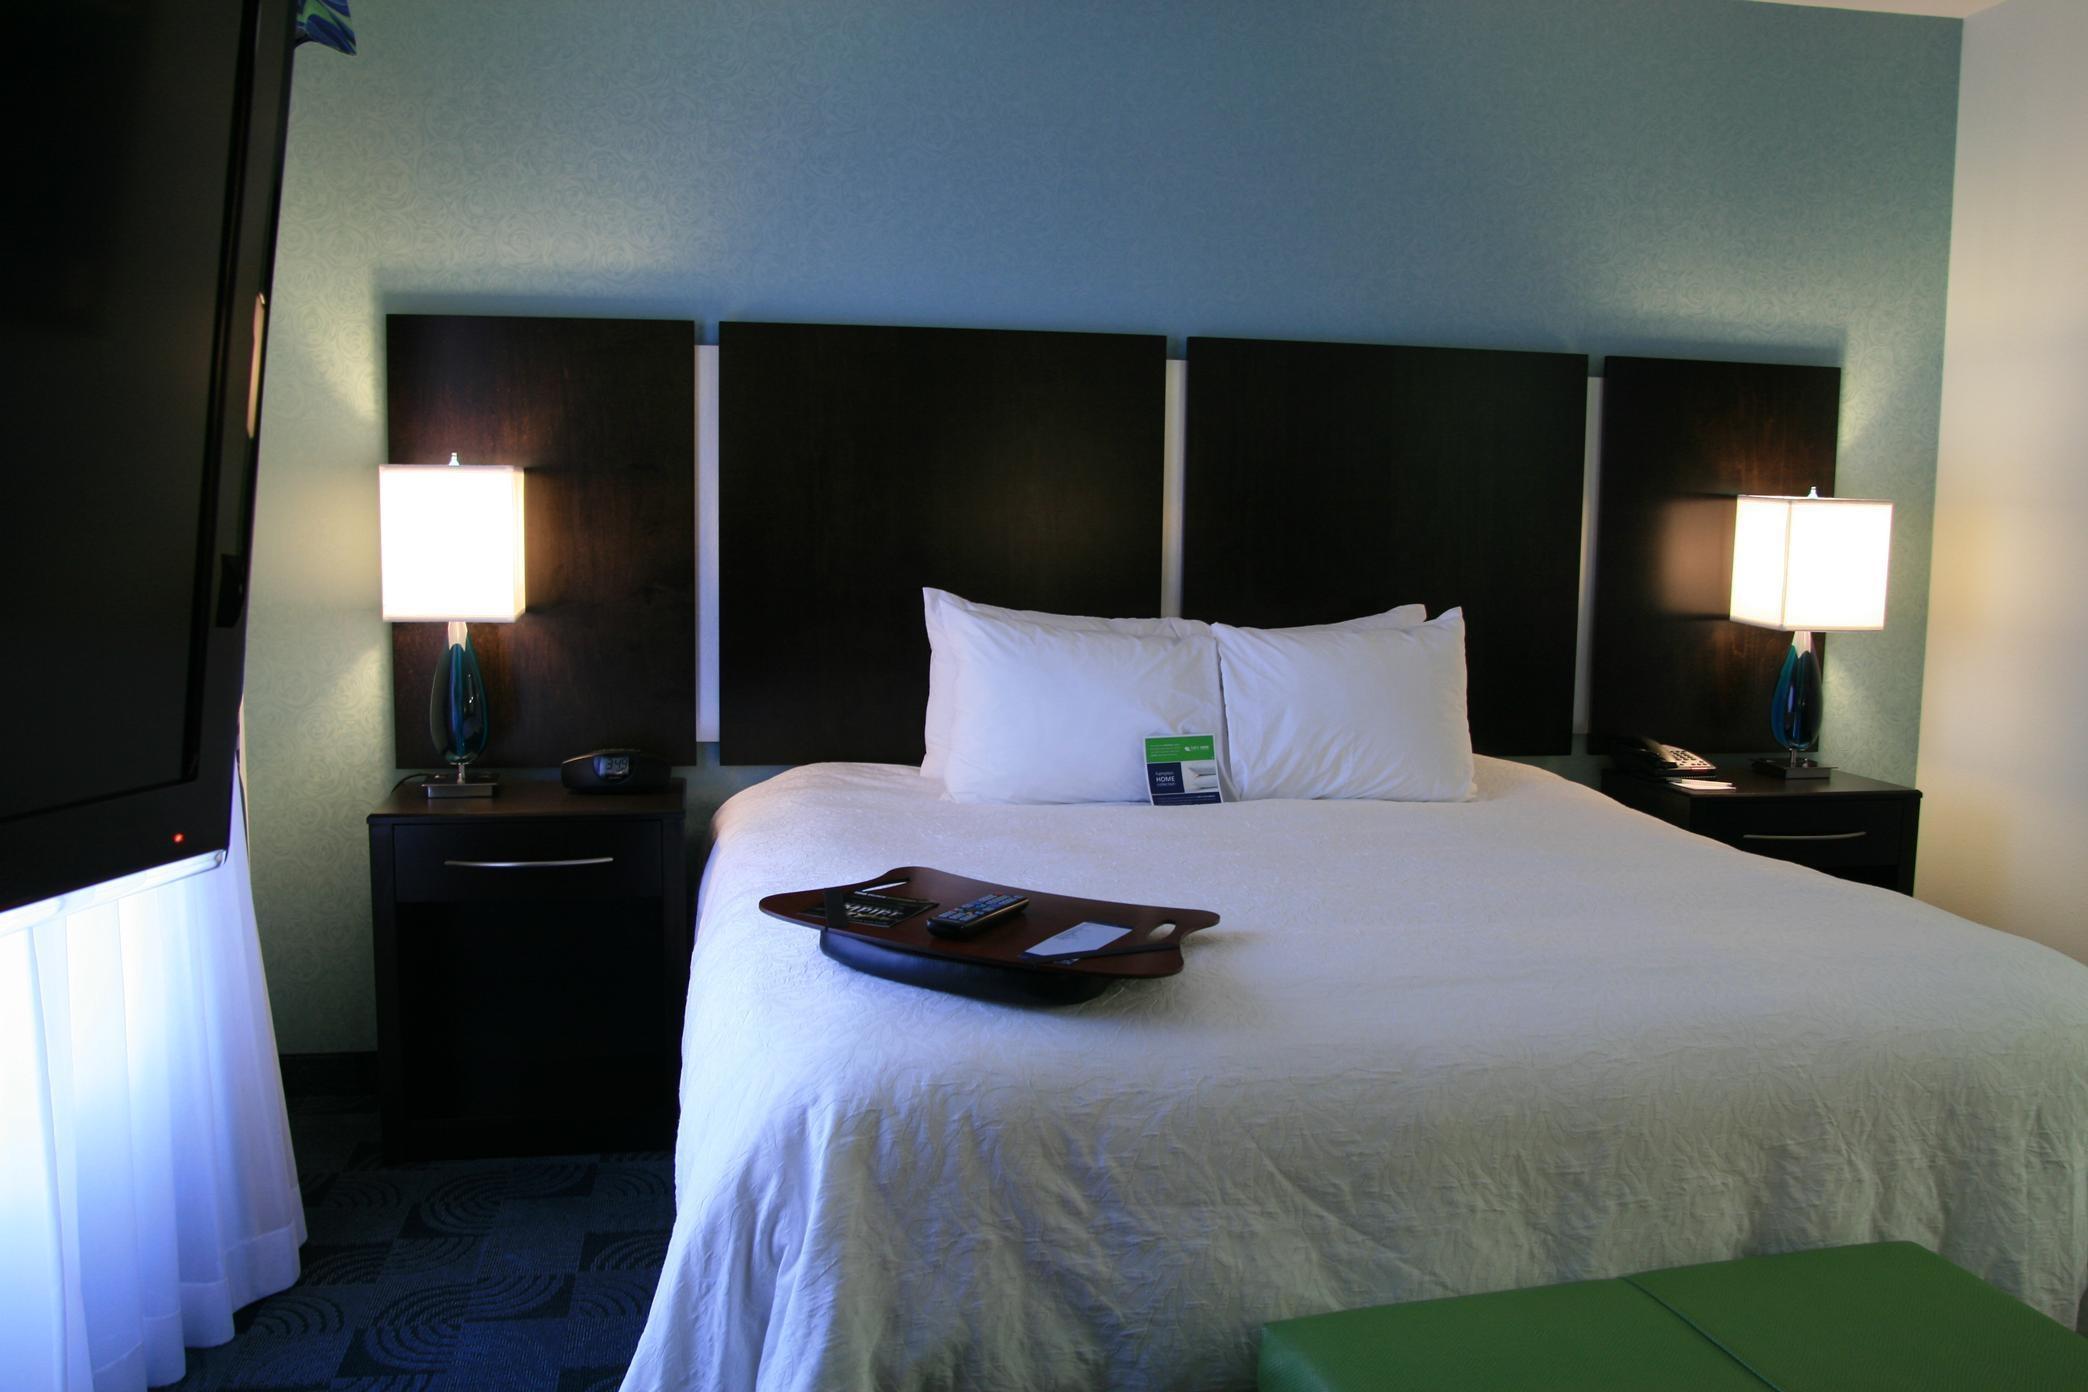 Hampton Inn & Suites Dallas/Lewisville-Vista Ridge Mall, TX image 19